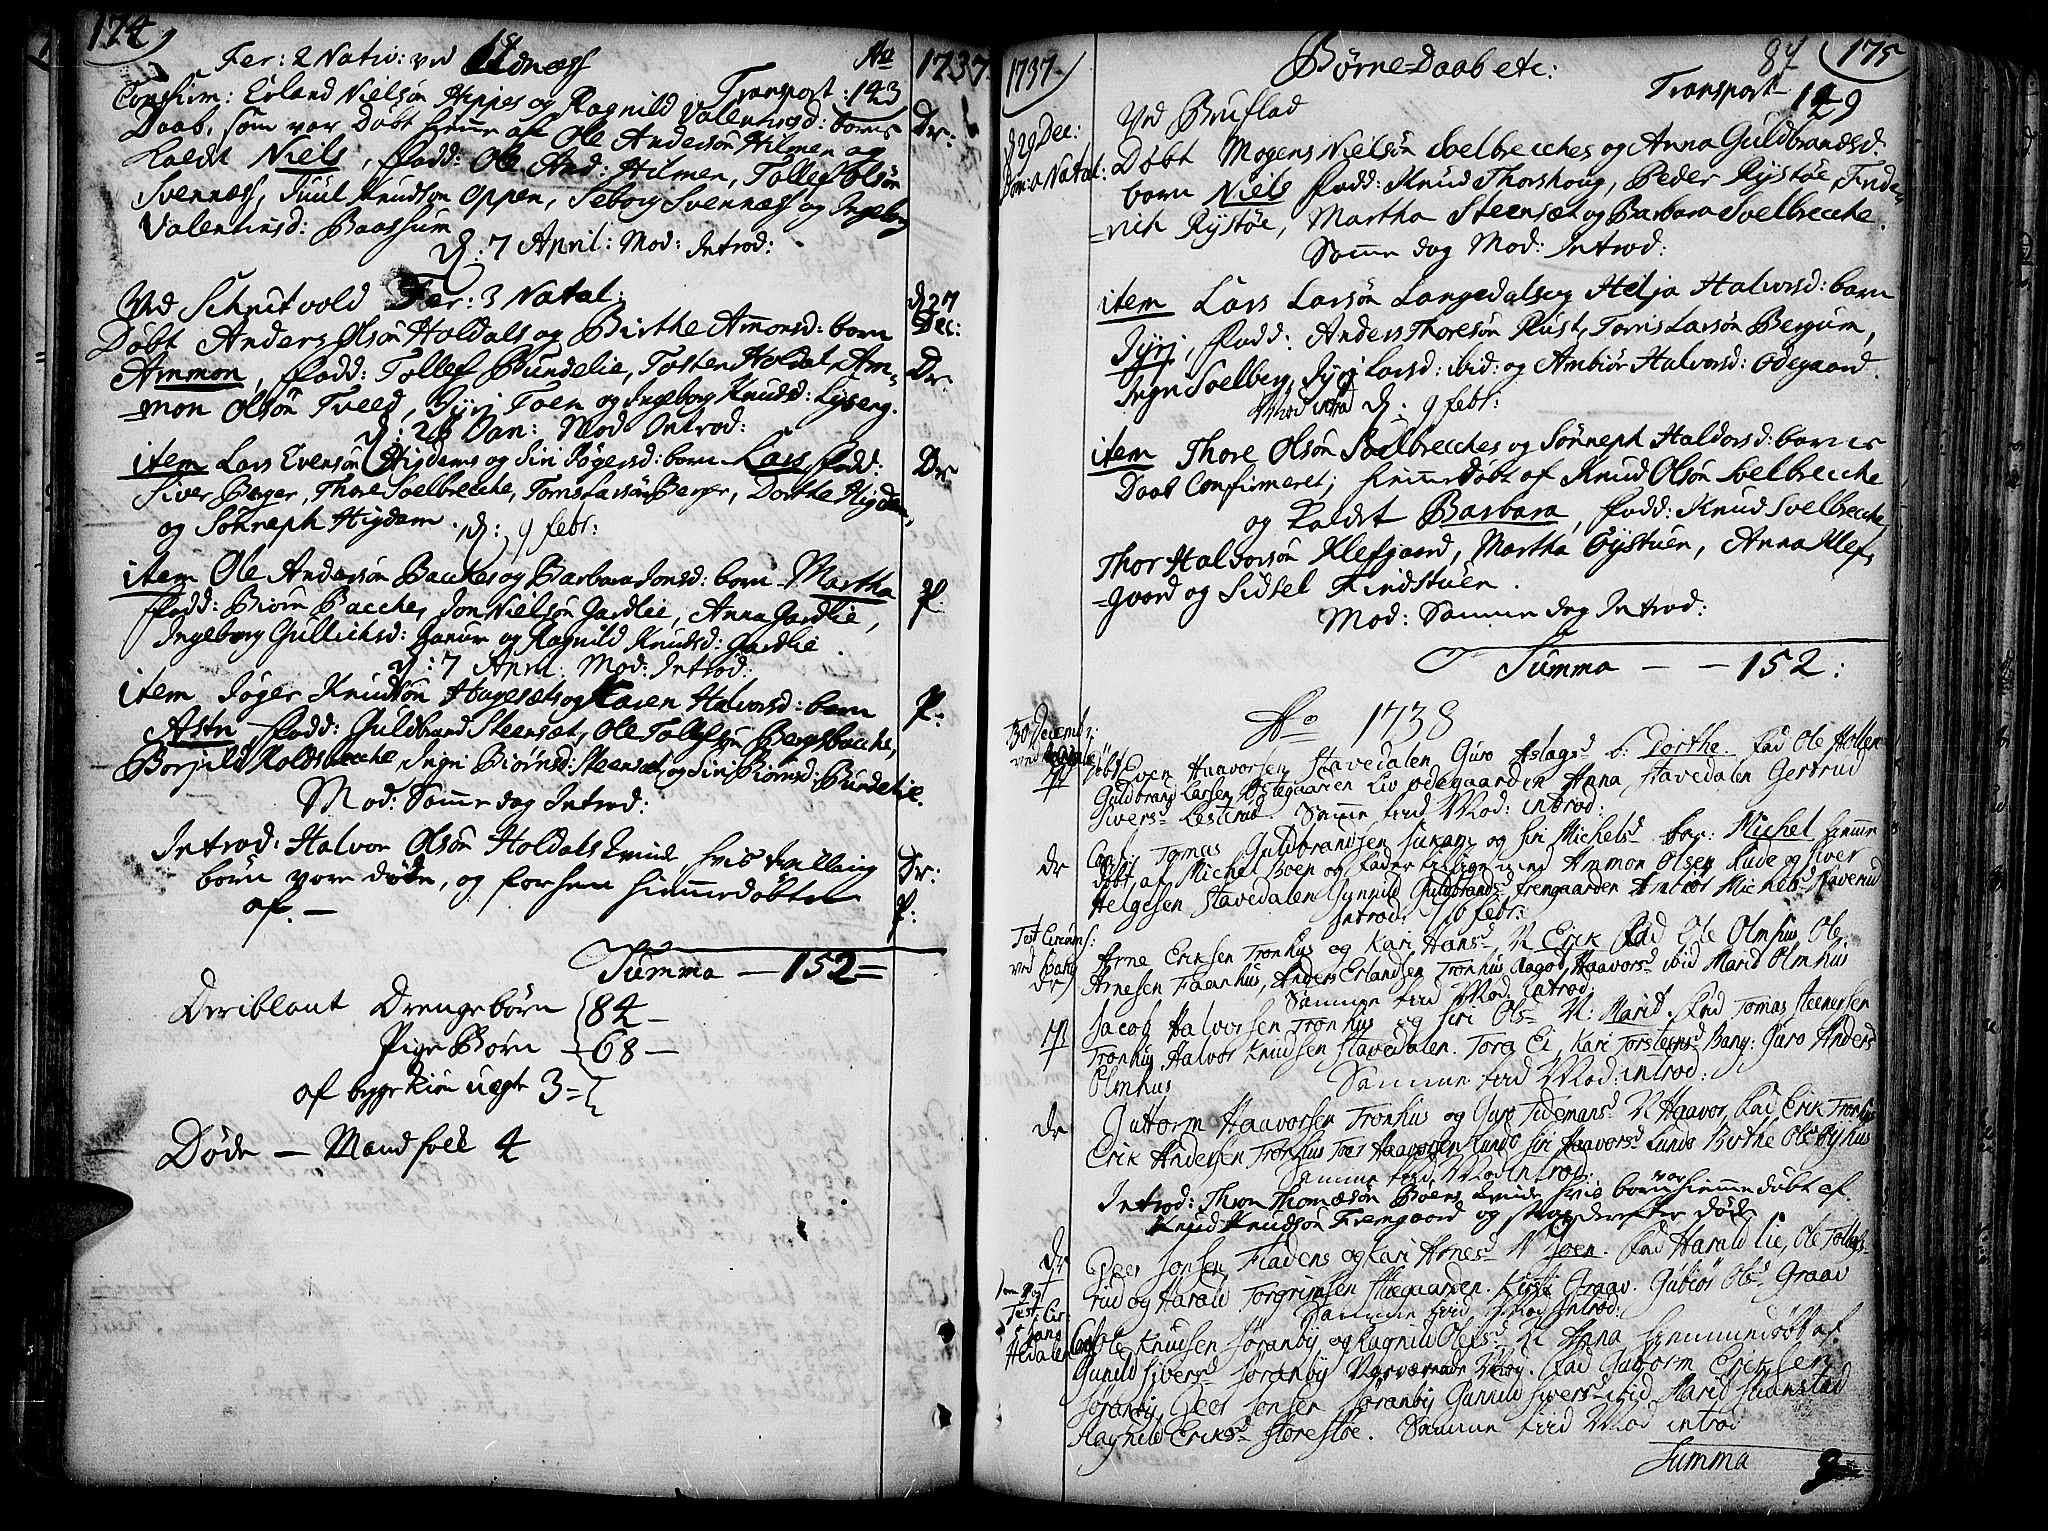 SAH, Aurdal prestekontor, Ministerialbok nr. 4, 1730-1762, s. 174-175